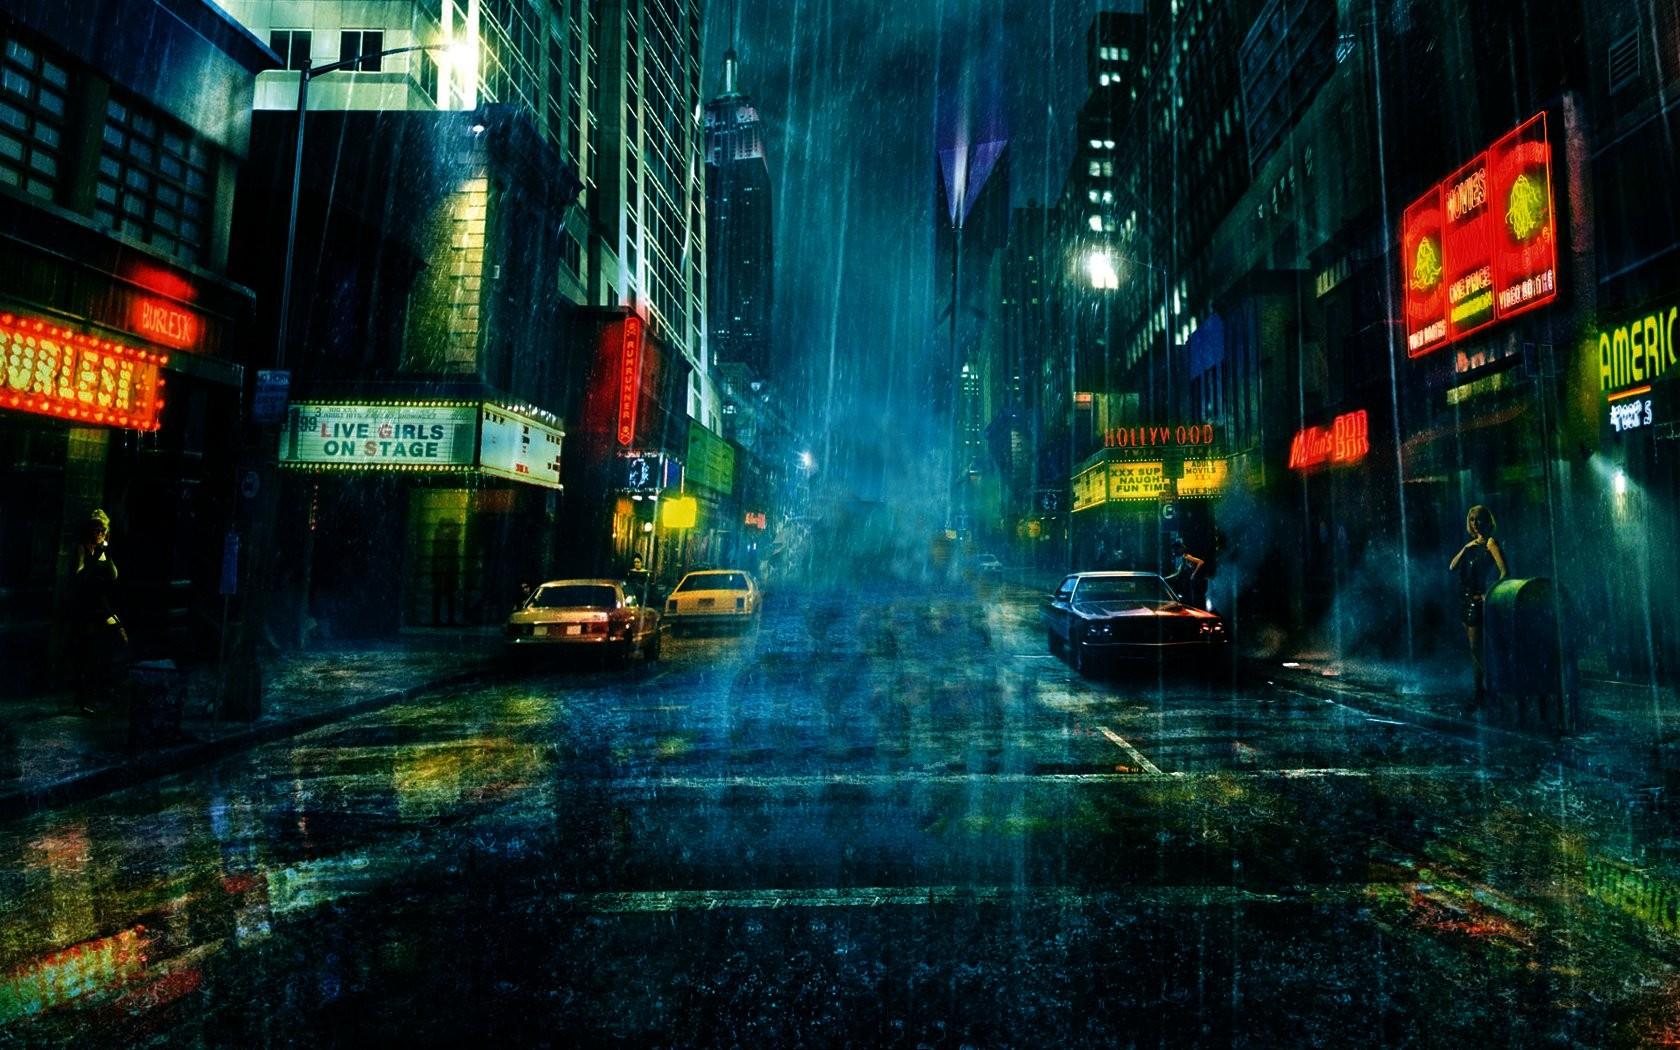 Rain City Wallpaper images of rain city wallpaper free - #sc